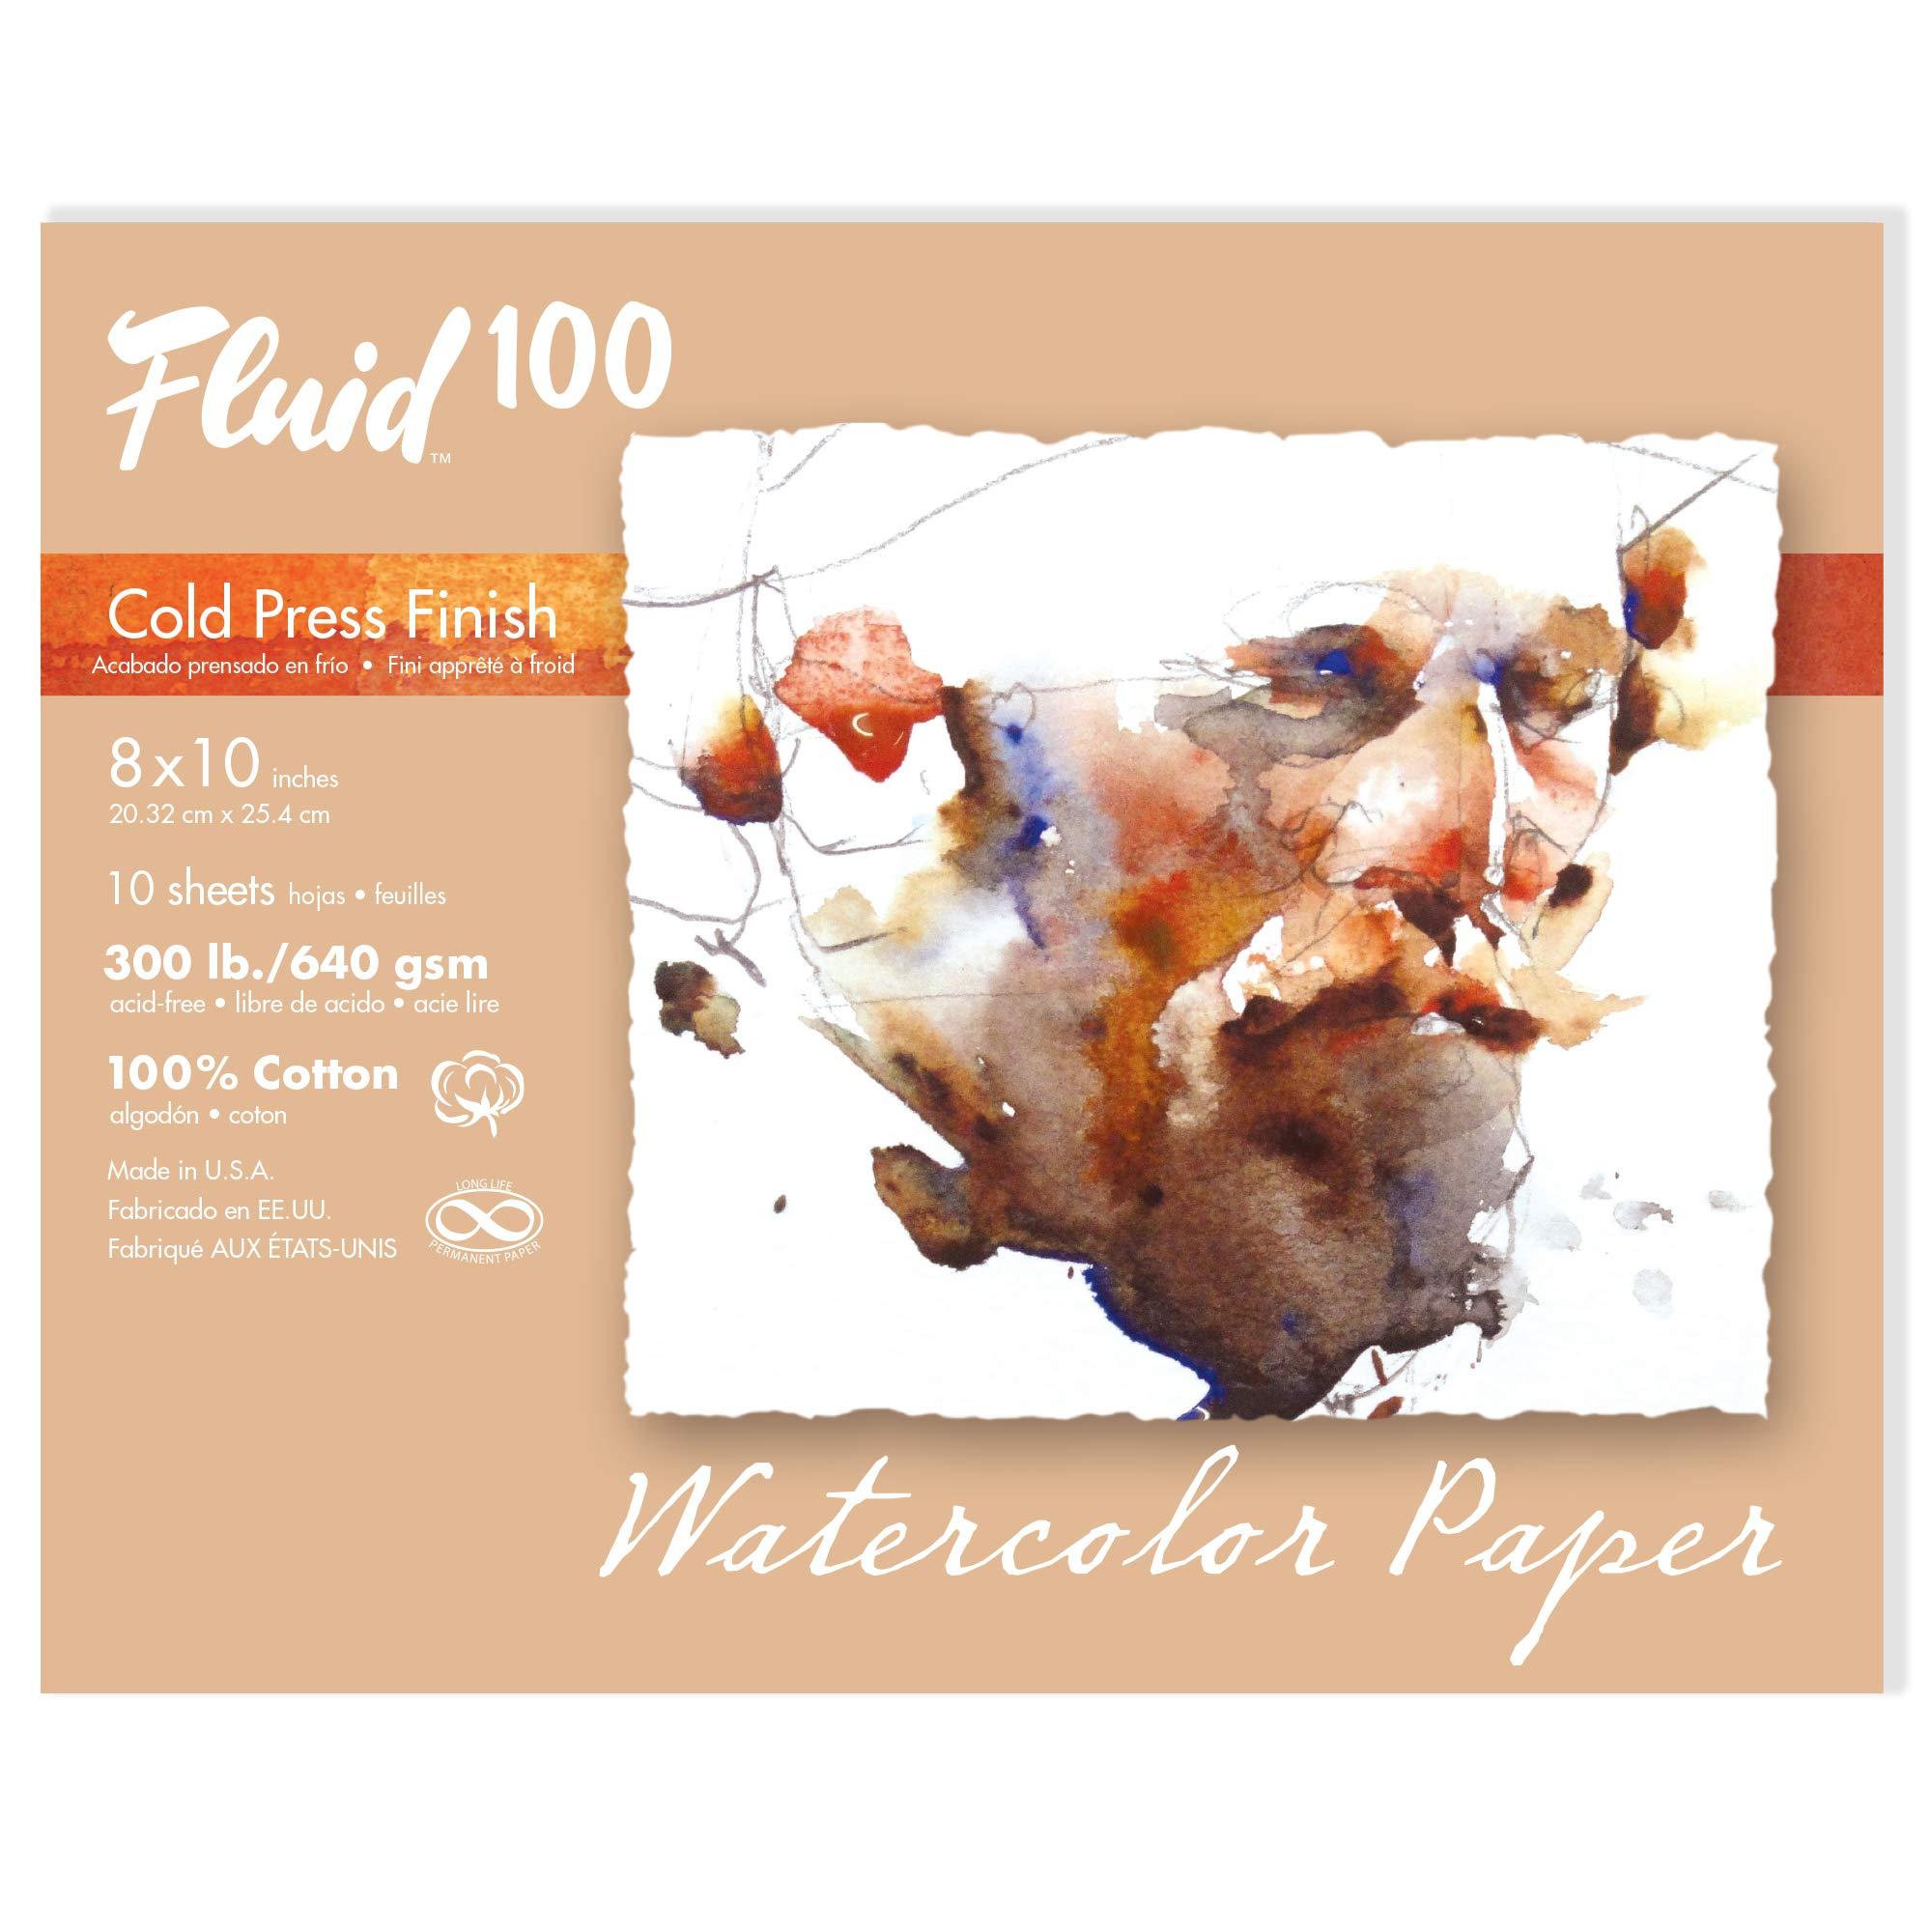 Speedball Art Products 821716 Fluid 100 Artist Watercolor Paper 300 lb Cold Press, 8 x 10-Inch Pochette, 100% Cotton 10 Count